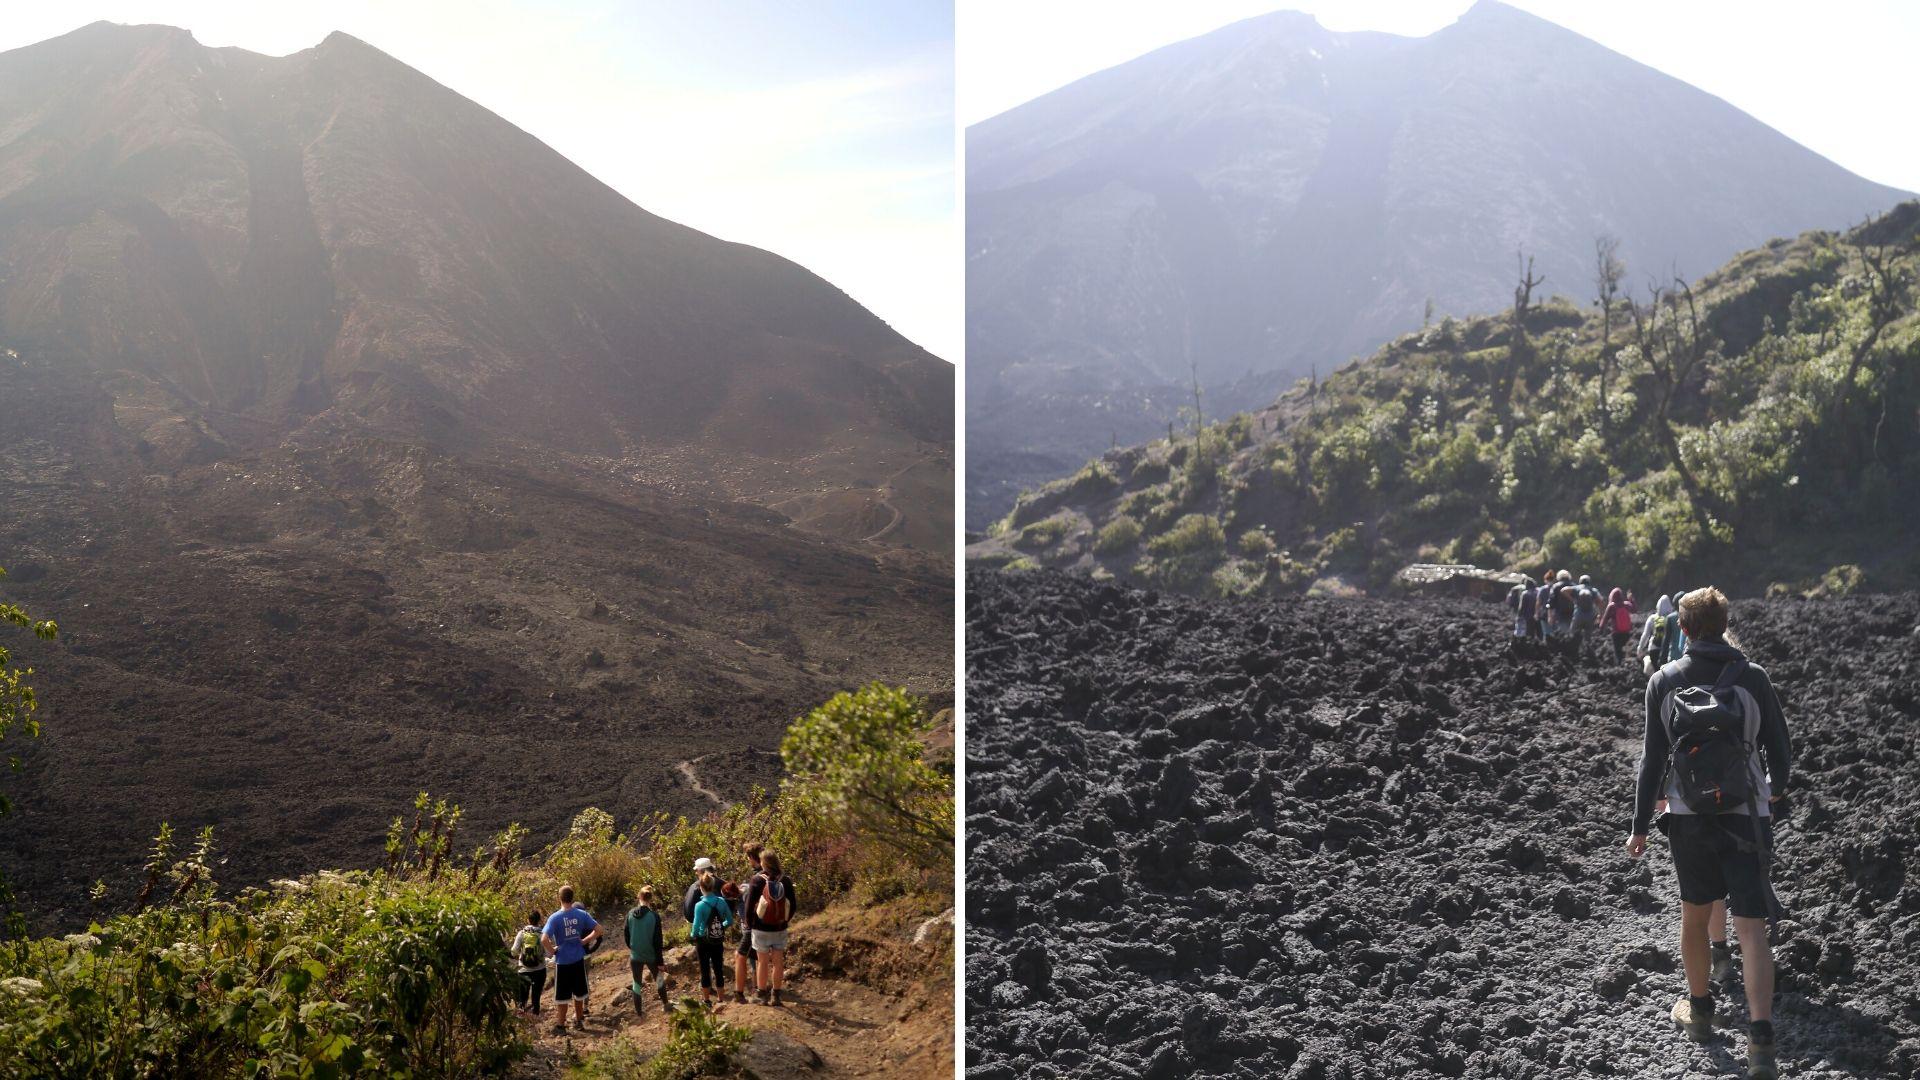 Guatemala ascension volcan Pacaya infos pratiques